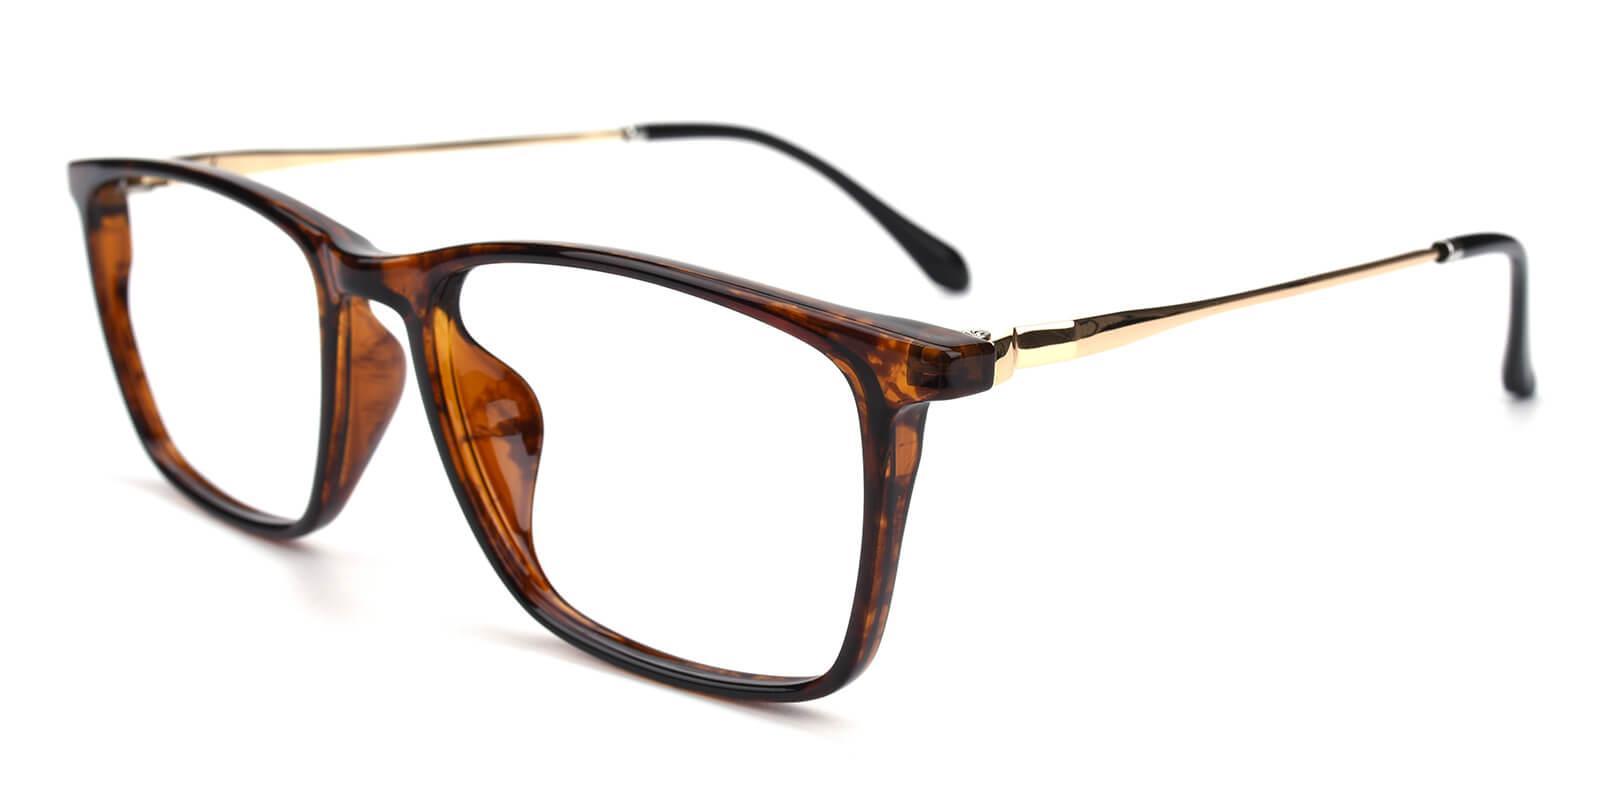 Erisony-Tortoise-Rectangle-TR-Eyeglasses-additional1